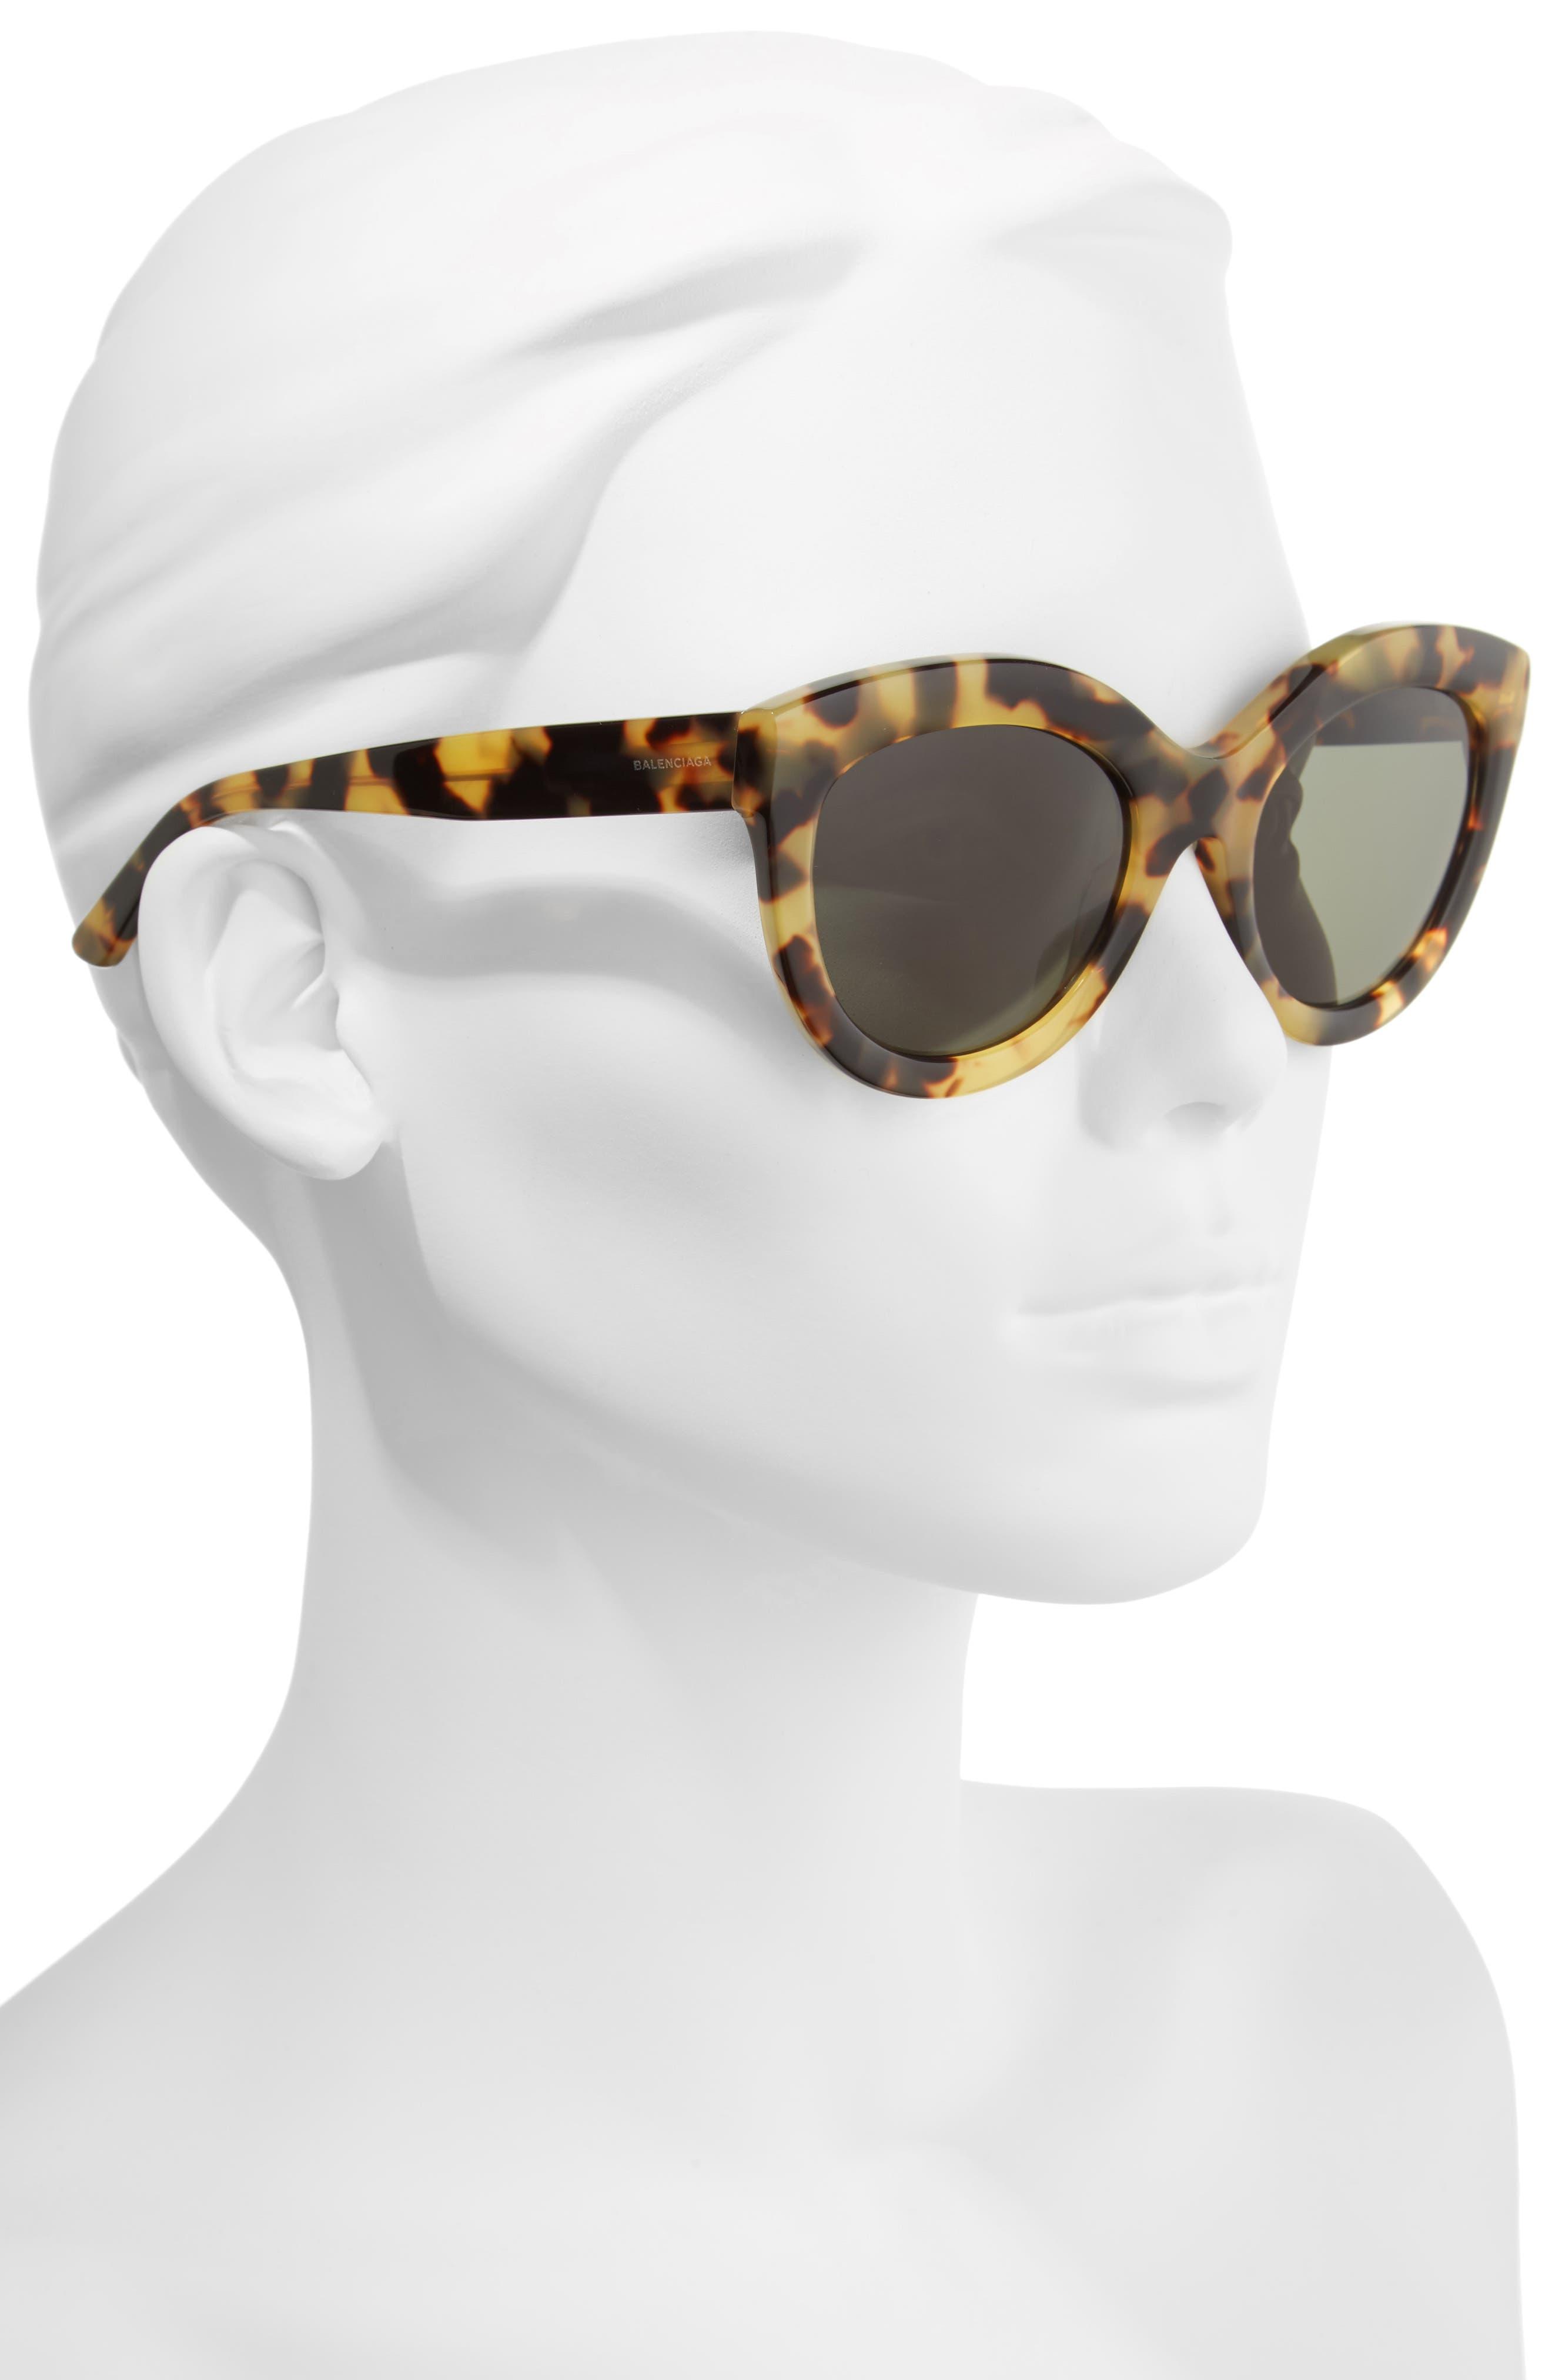 54mm Cat Eye Sunglasses,                             Alternate thumbnail 2, color,                             200